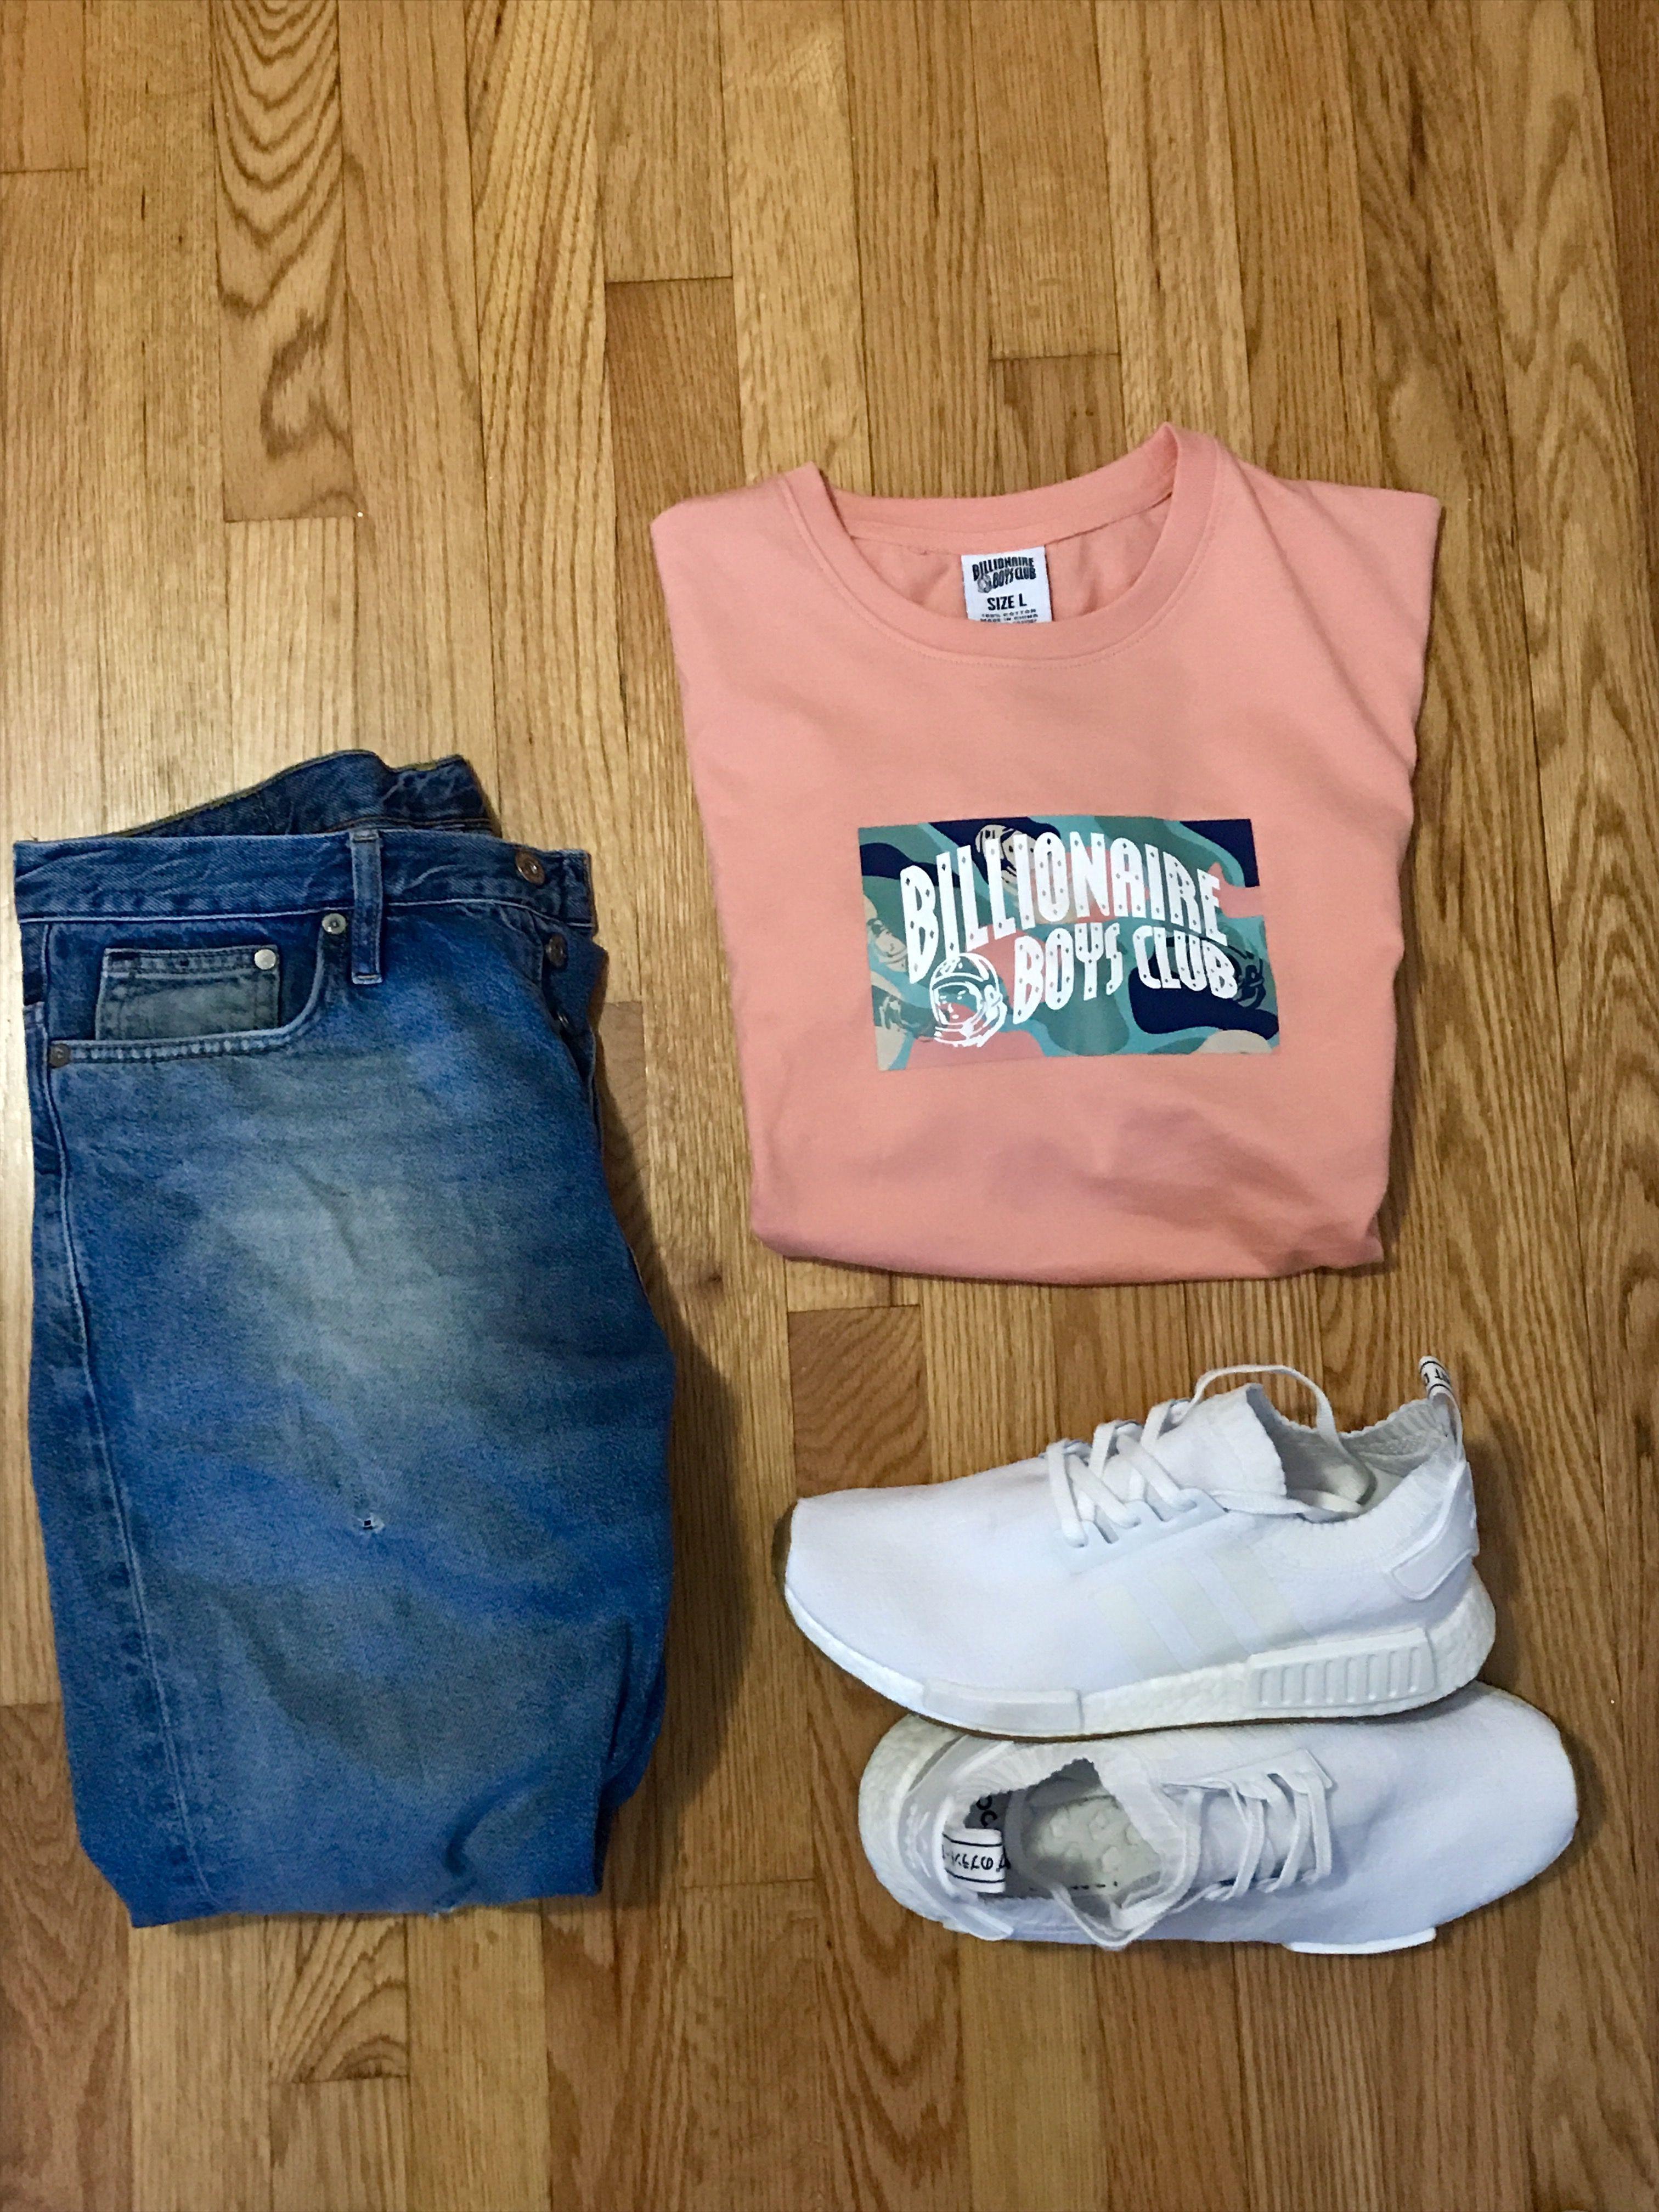 Simple Fit BBC TShirt Adidas NMD gumdrop Estilo